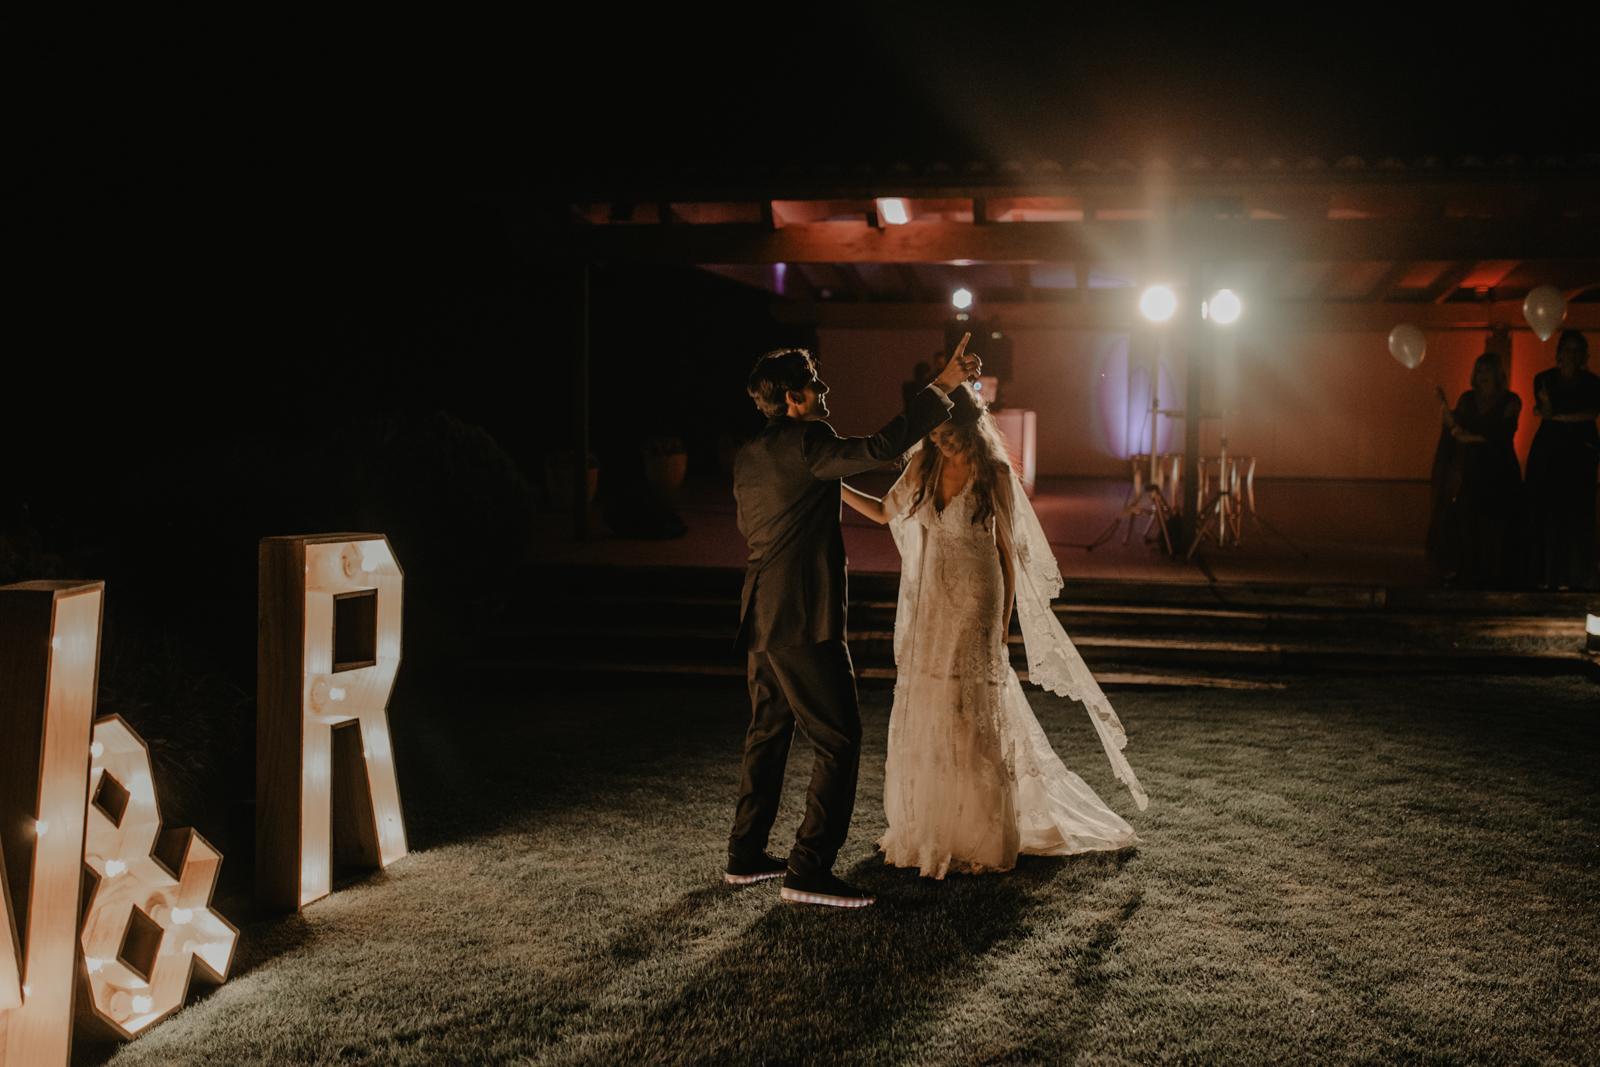 thenortherngirlphotography_photography_thenortherngirl_rebeccascabros_wedding_weddingphotography_weddingphotographer_barcelona_bodaenbarcelona_bodaenmaselmarti_bodarogeryvane-970.jpg